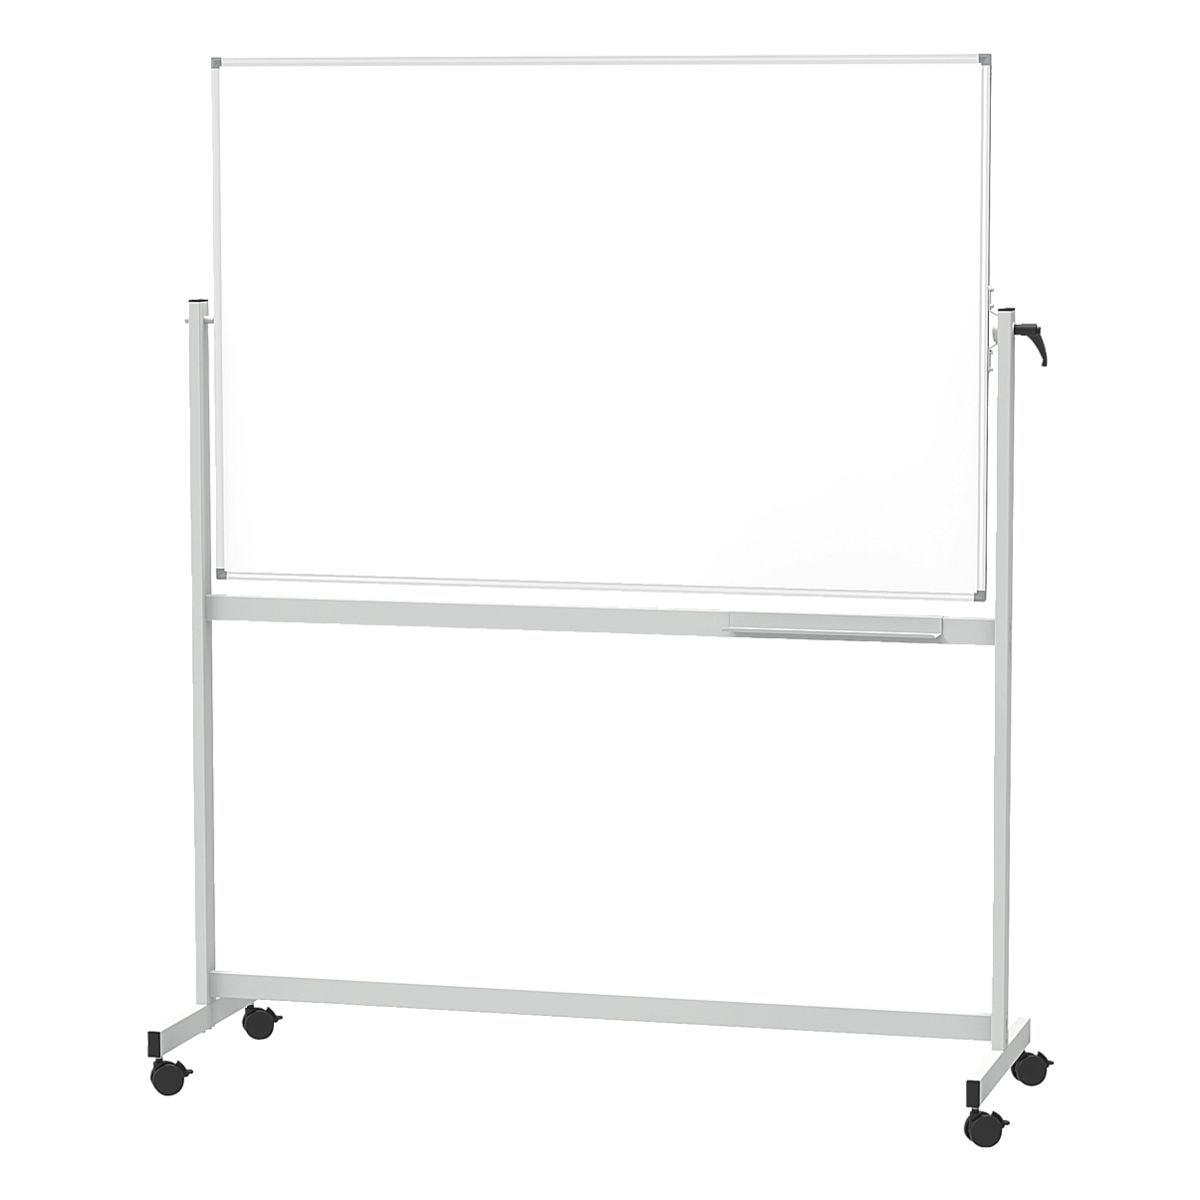 Maul Whiteboard Maul Standard 6459484 kunststoffbeschichtet, 180x120 cm